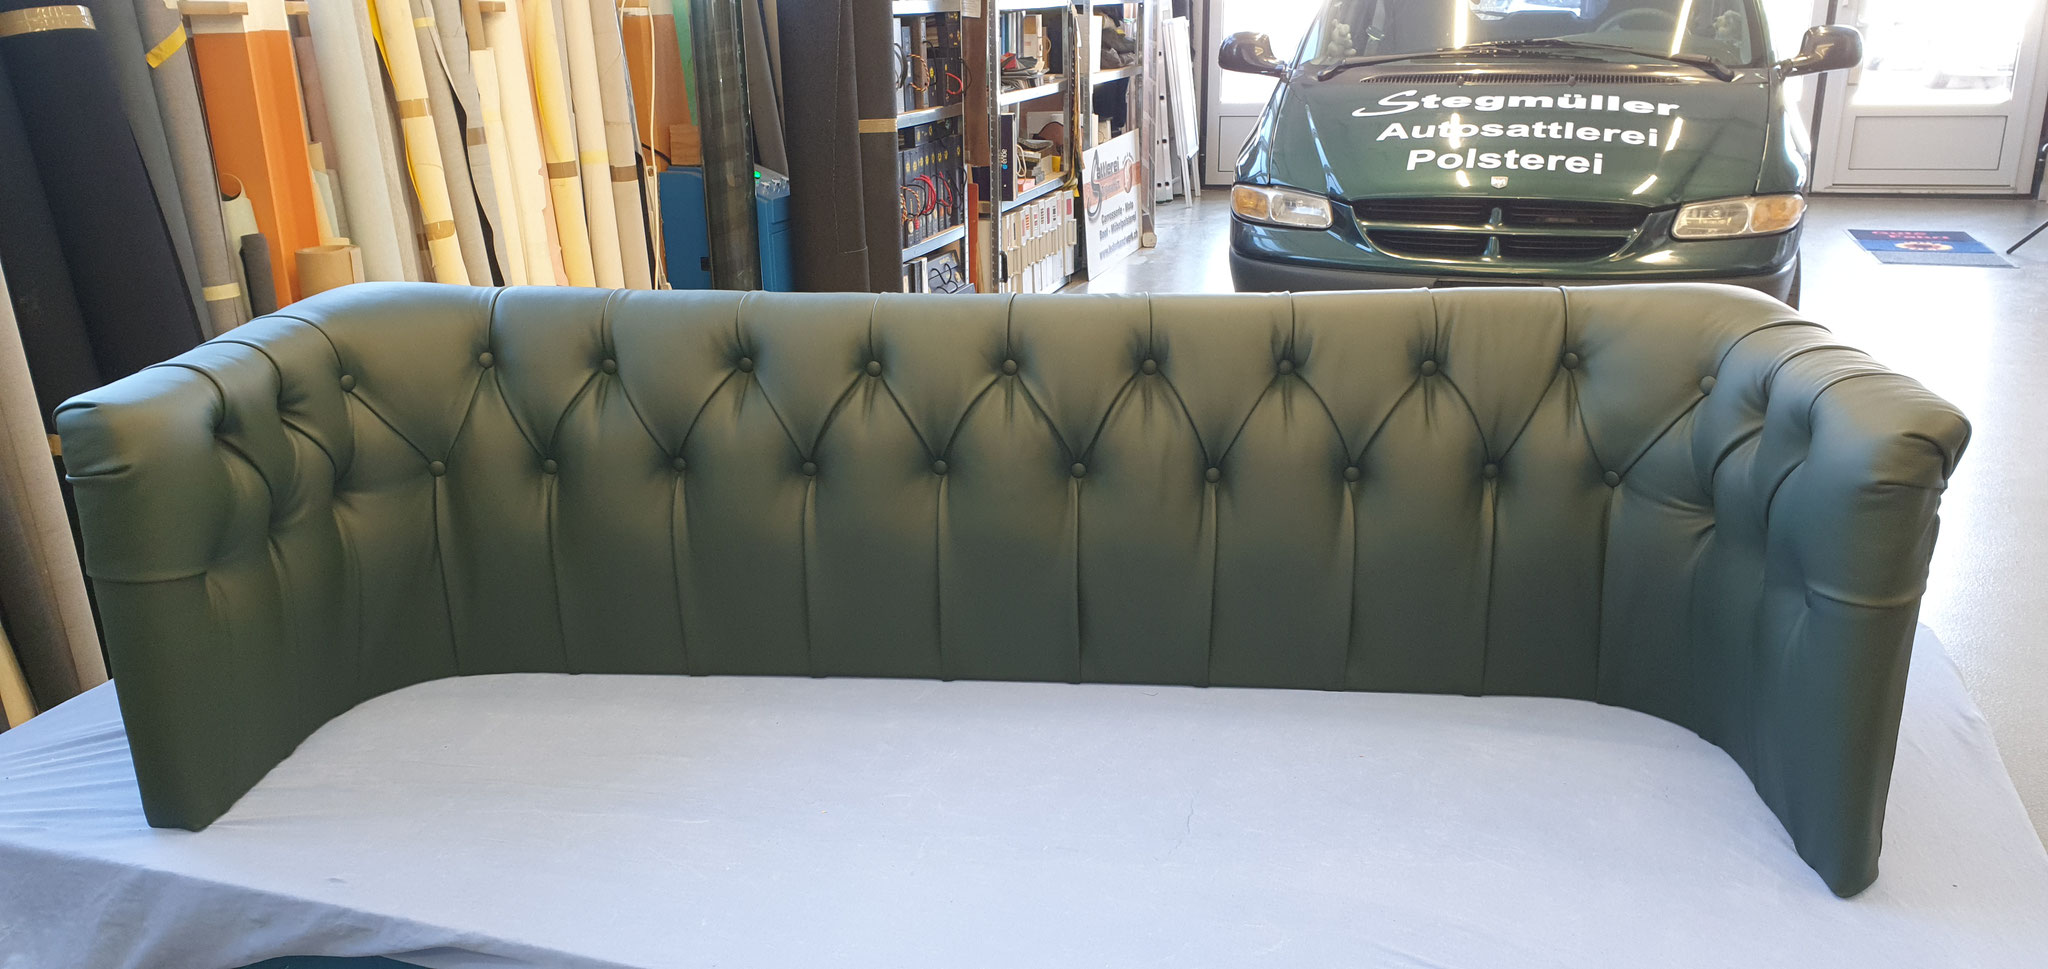 Sofa Rücken neu mit Leder Tapiniert